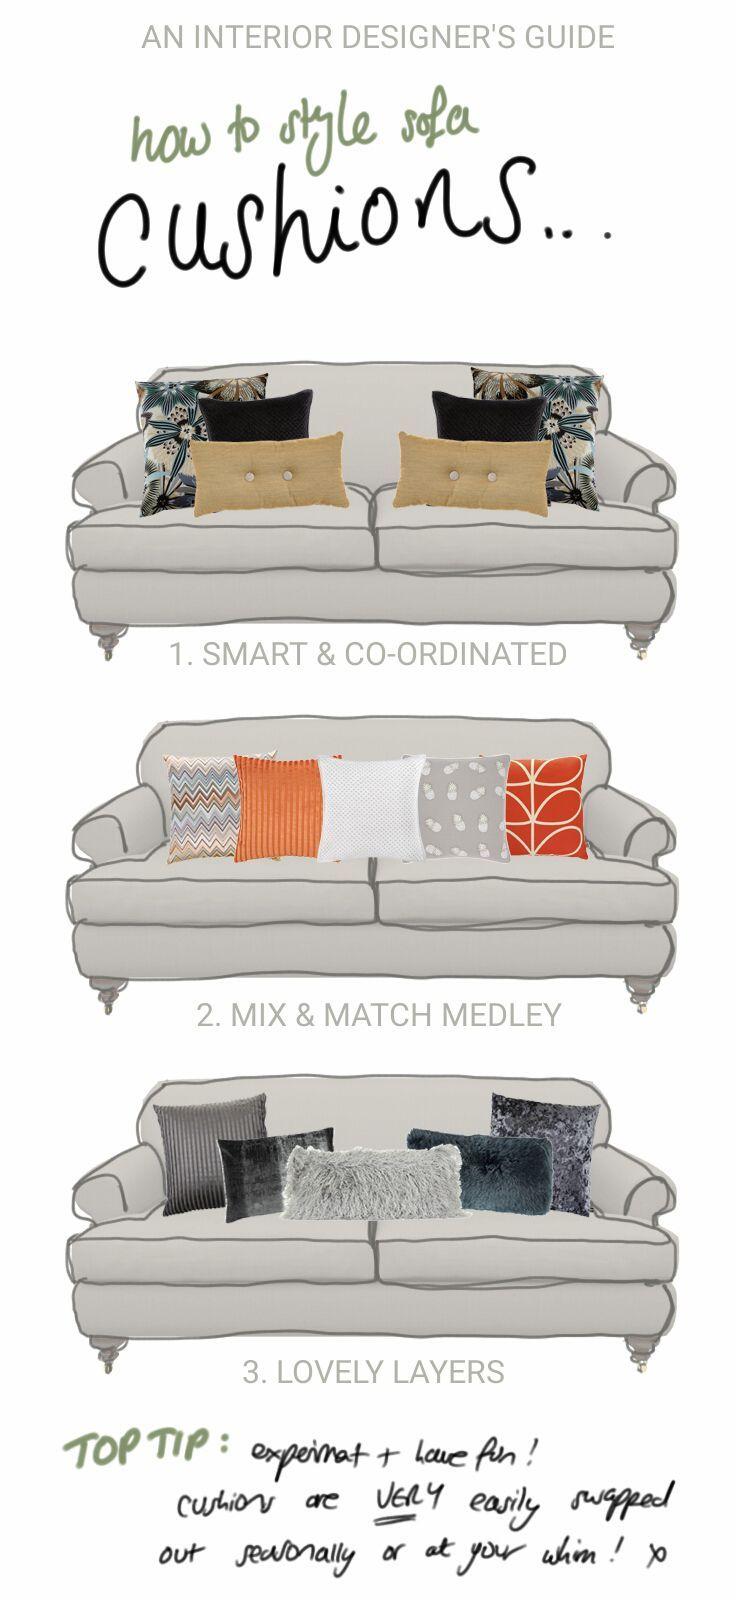 how to style sofa cushions like an